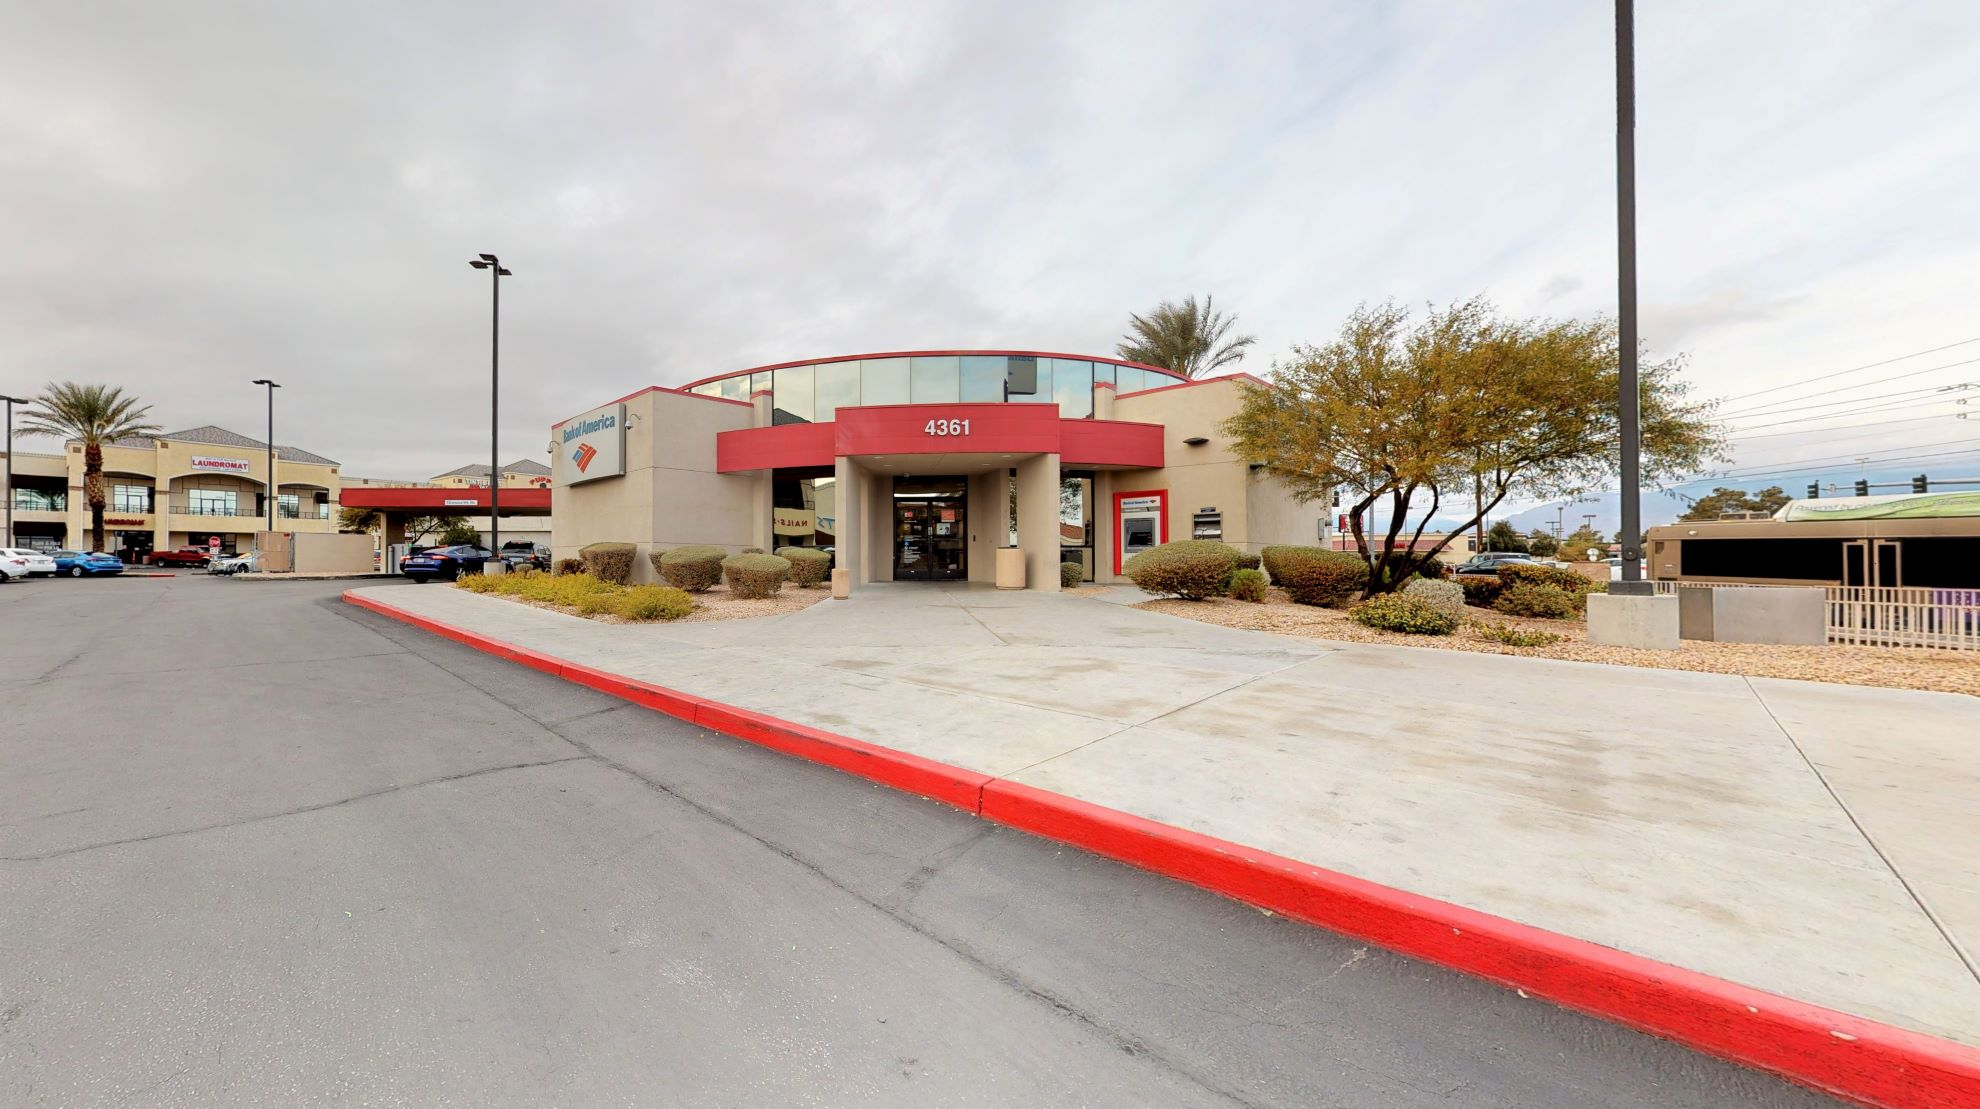 Bank of America financial center with drive-thru ATM | 4361 N Rancho Dr, Las Vegas, NV 89130